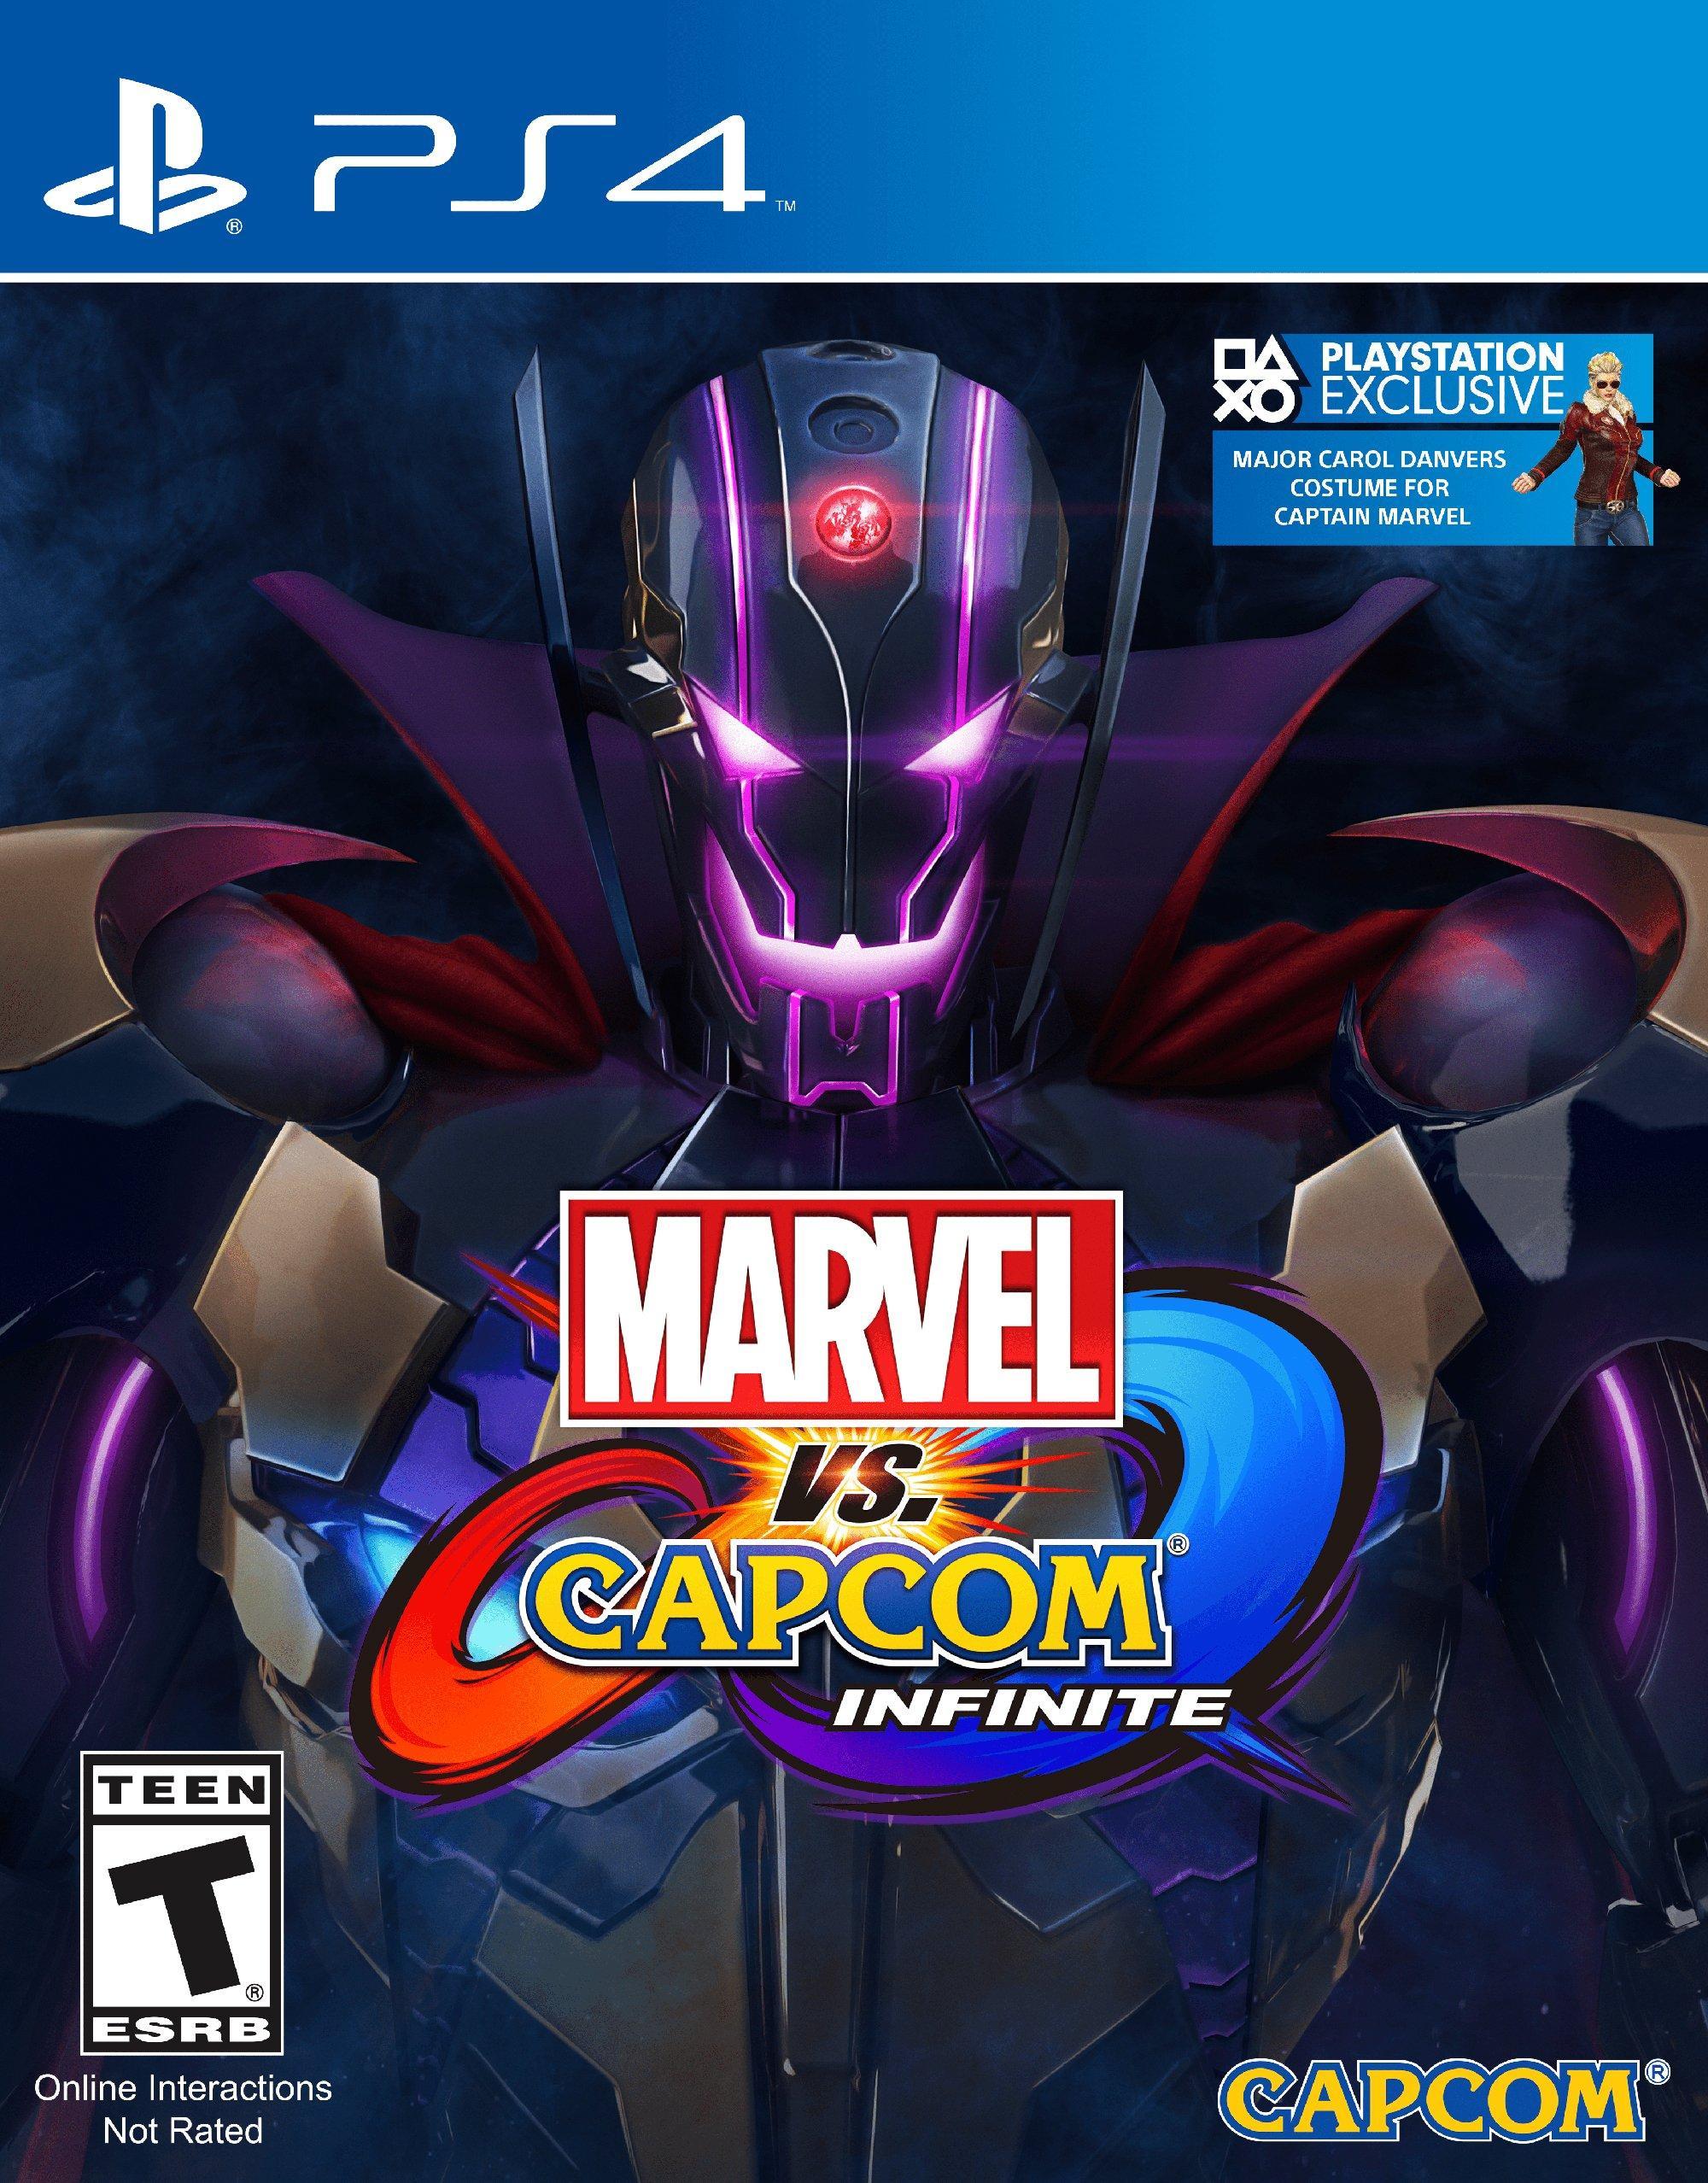 Marvel vs Capcom: Infinite Deluxe Edition | PlayStation 4 | GameStop